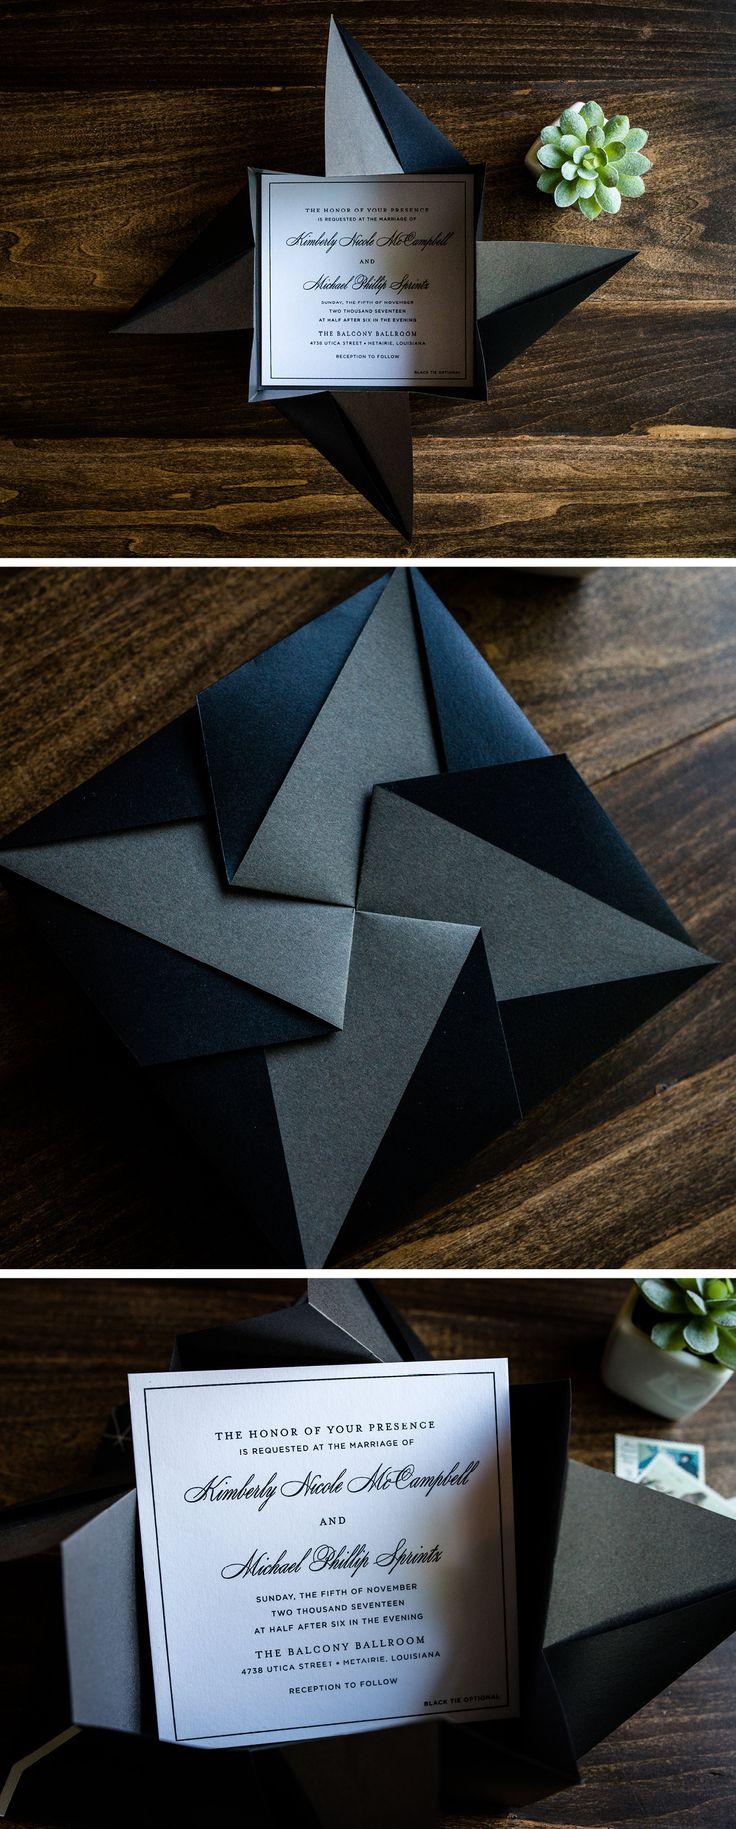 sample wedding invitation letter for uk visa%0A Unique Black Origami Wedding Invitation by Penn  u     Paperie  Modern Wedding  Invitation Design for Black